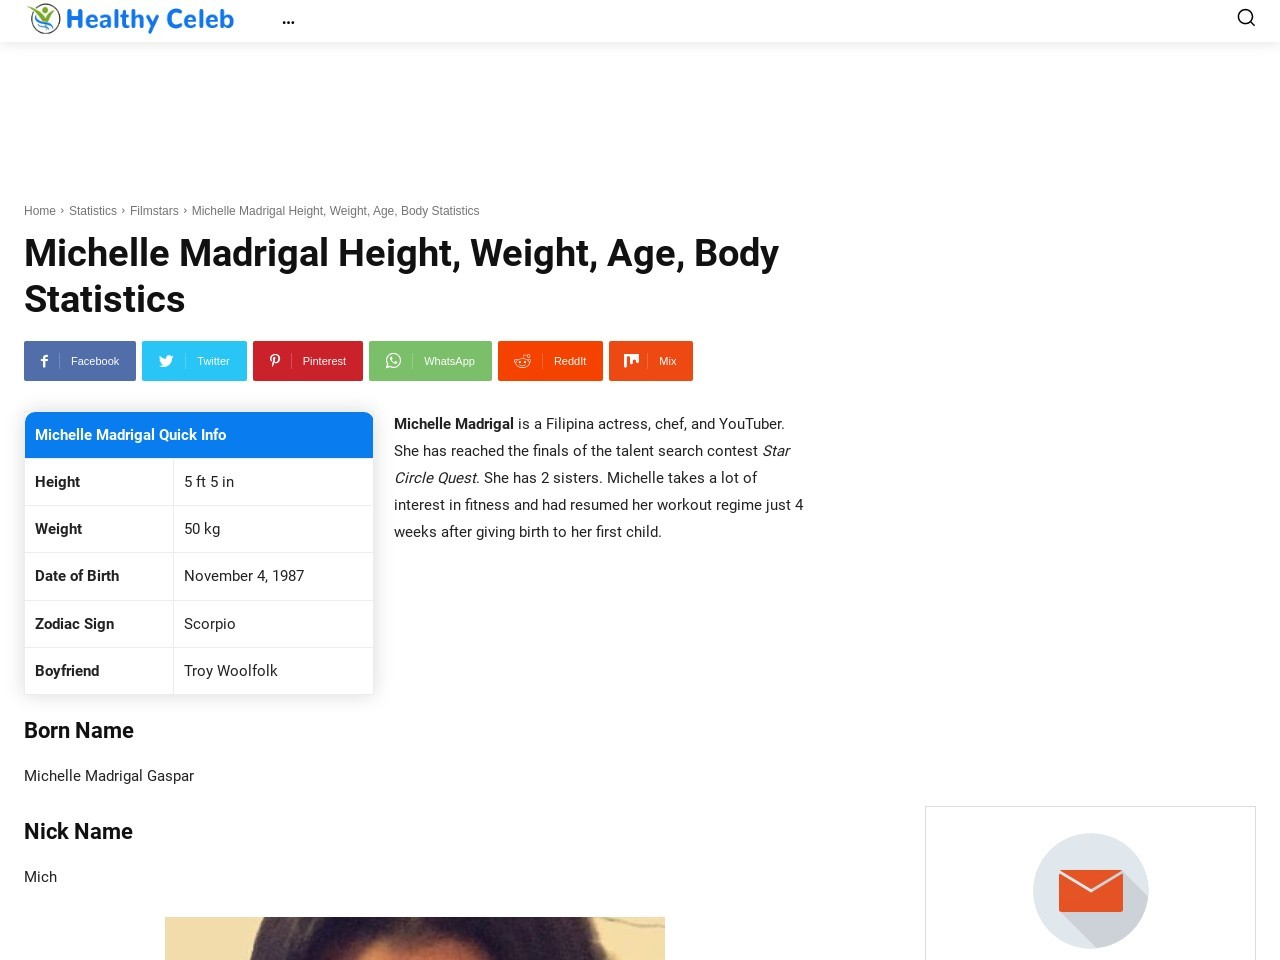 Michelle Madrigal Peak, Weight, Age, Body Statistics